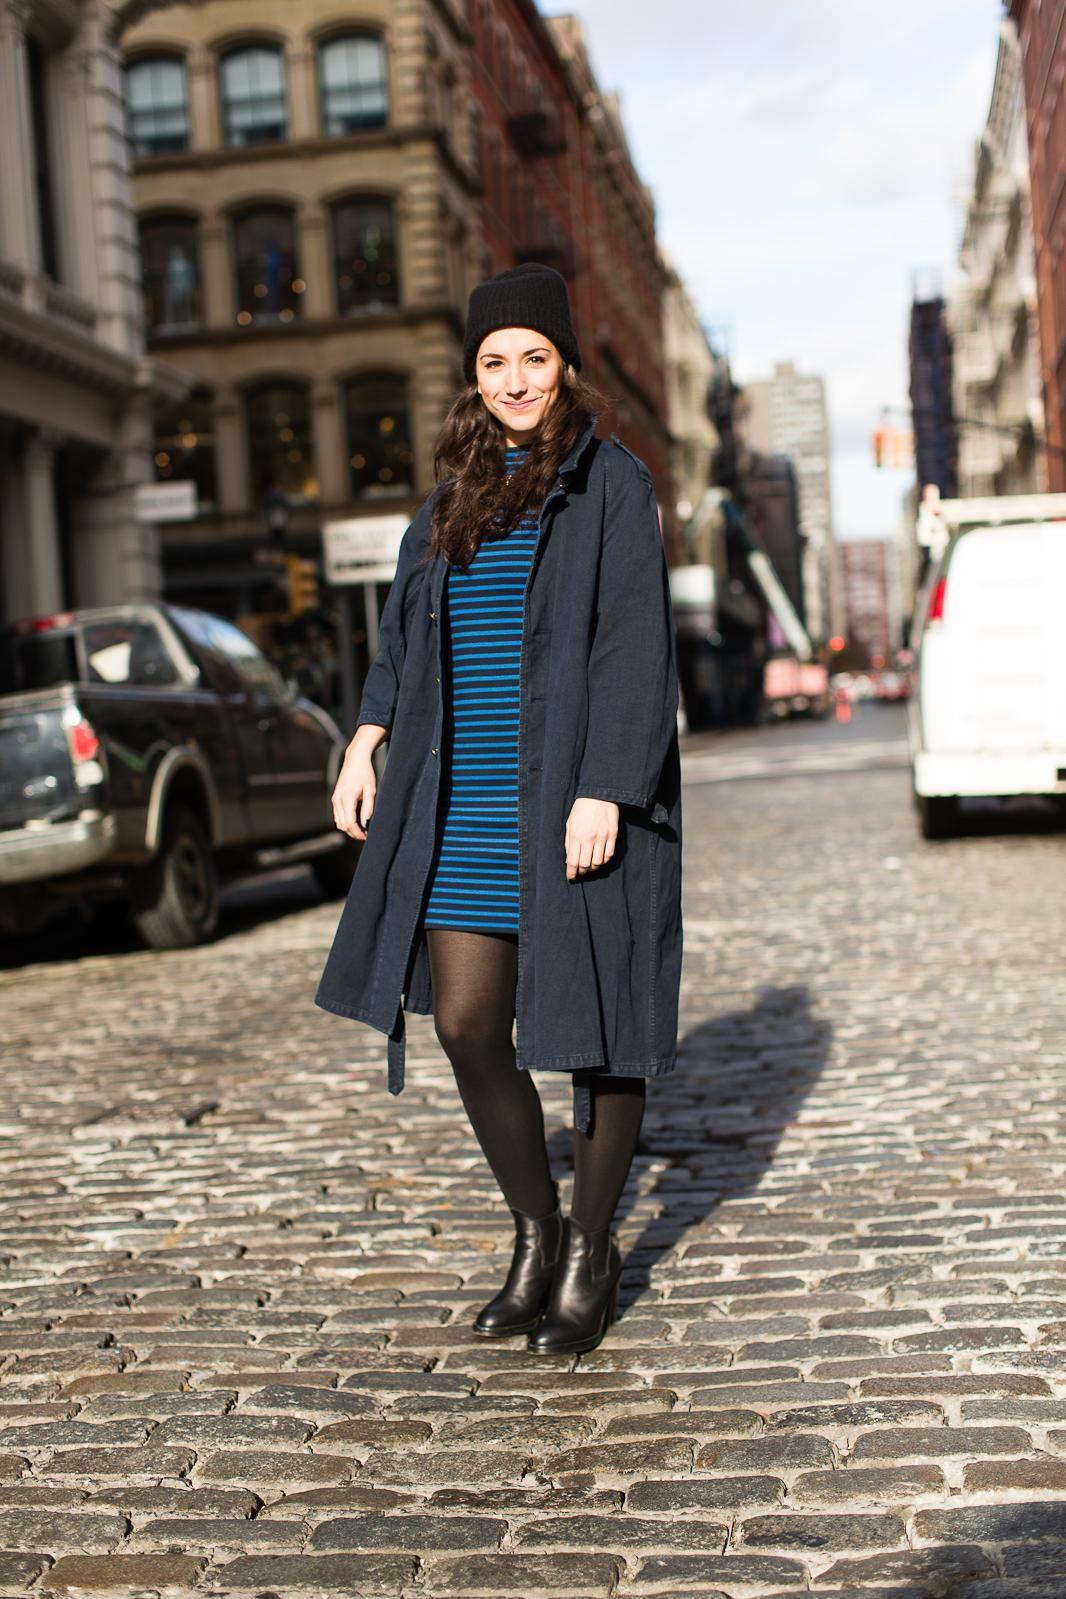 Unexpected street style looks we love